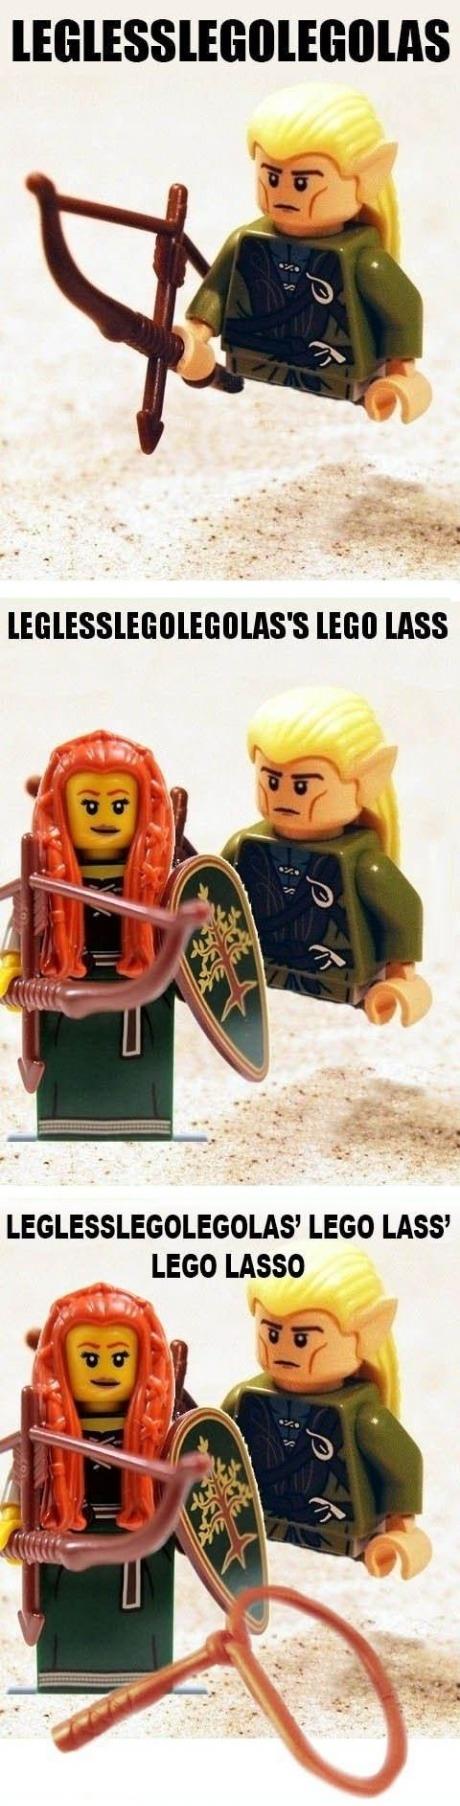 Legless Lego Legolas